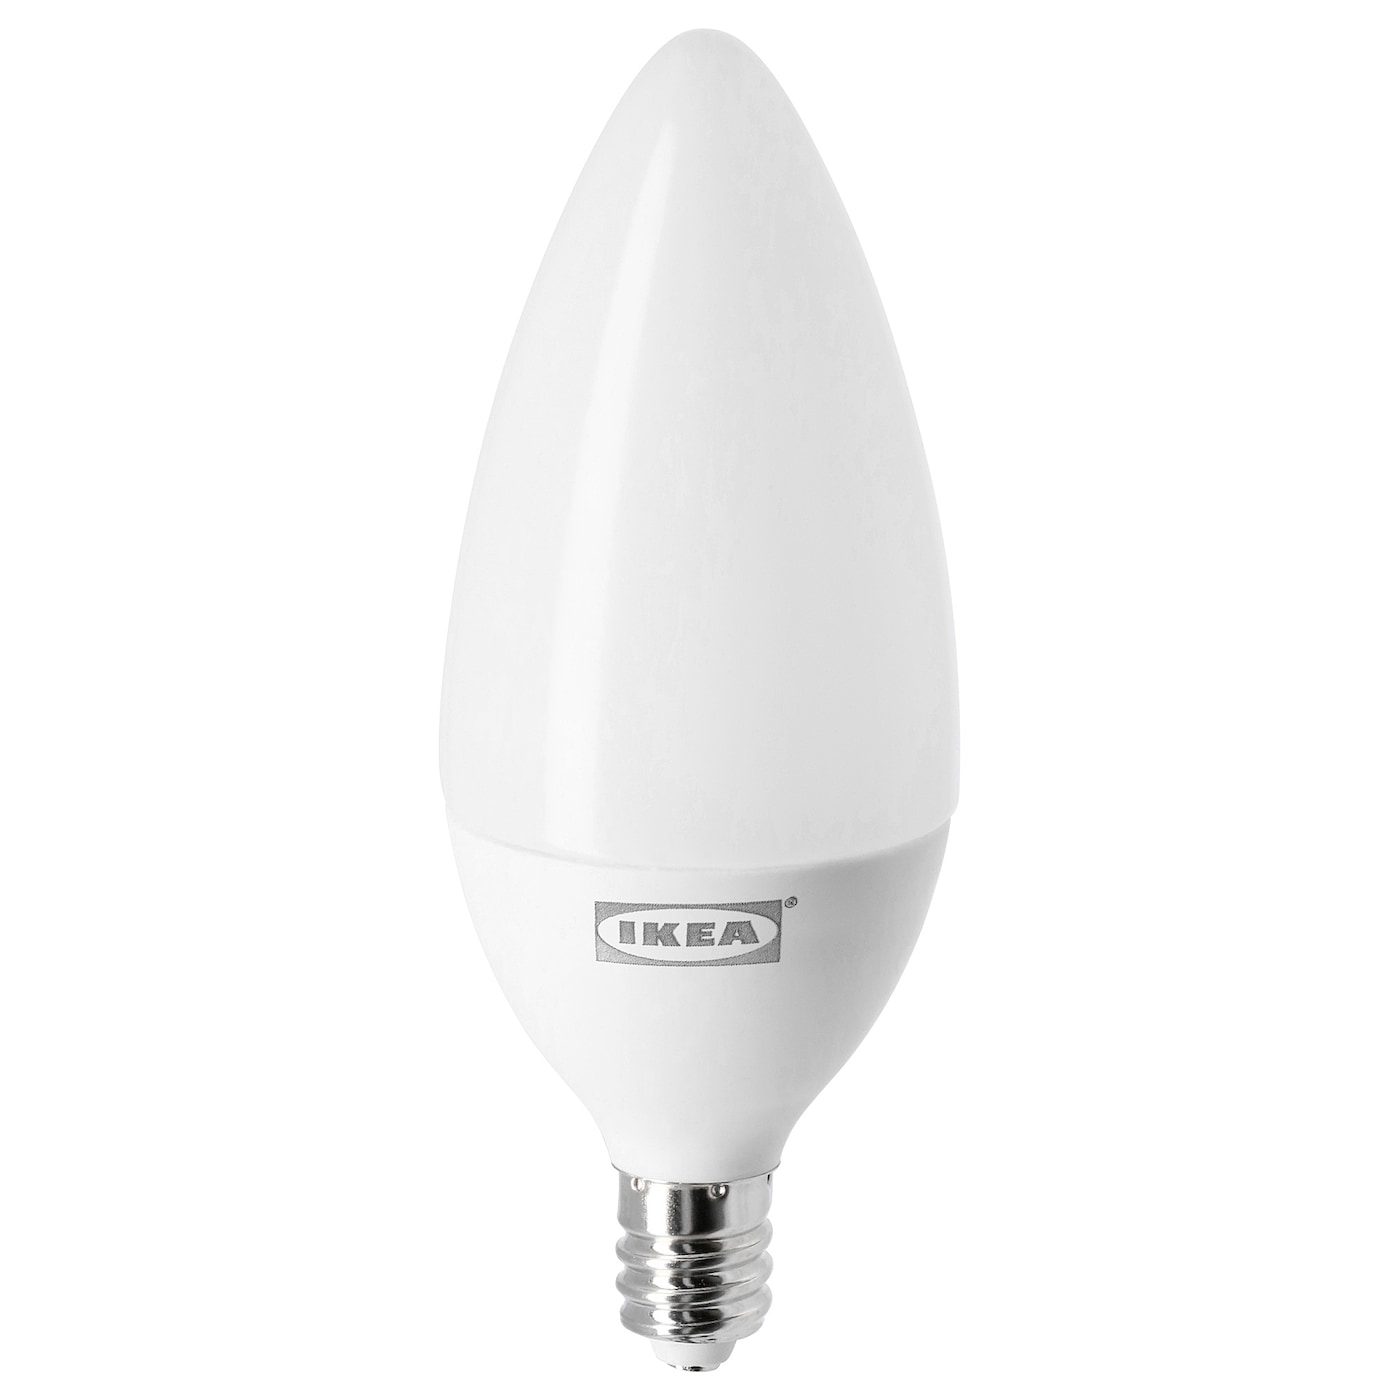 Best Ikea Smart Home Gadgets